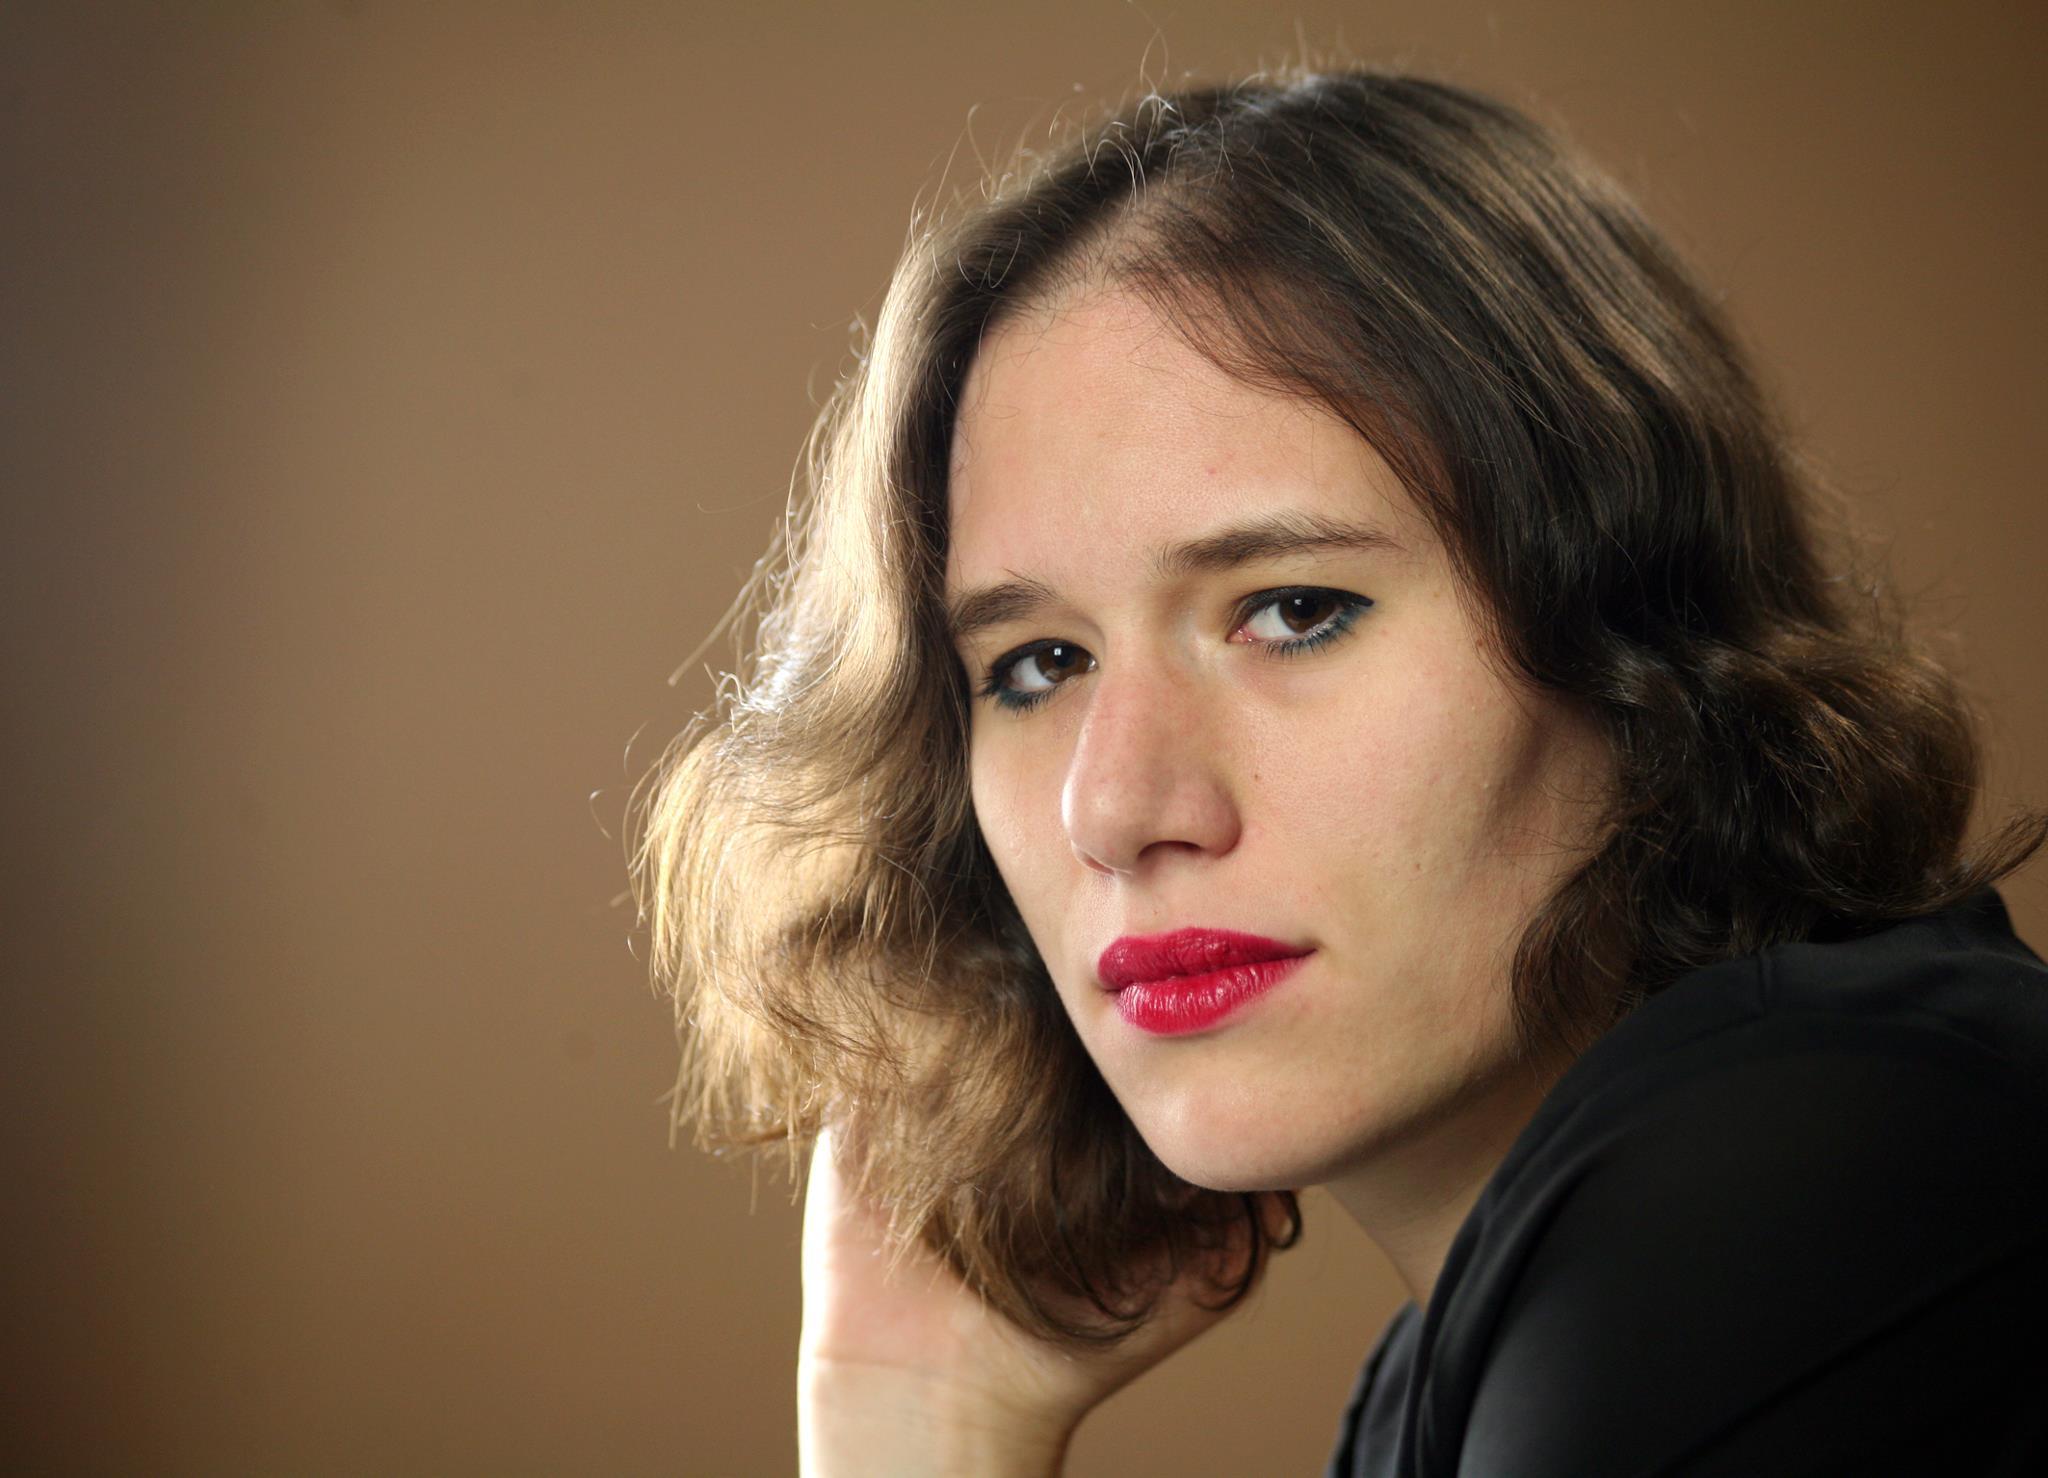 Katja Perat, photo by Tihomir Pintar